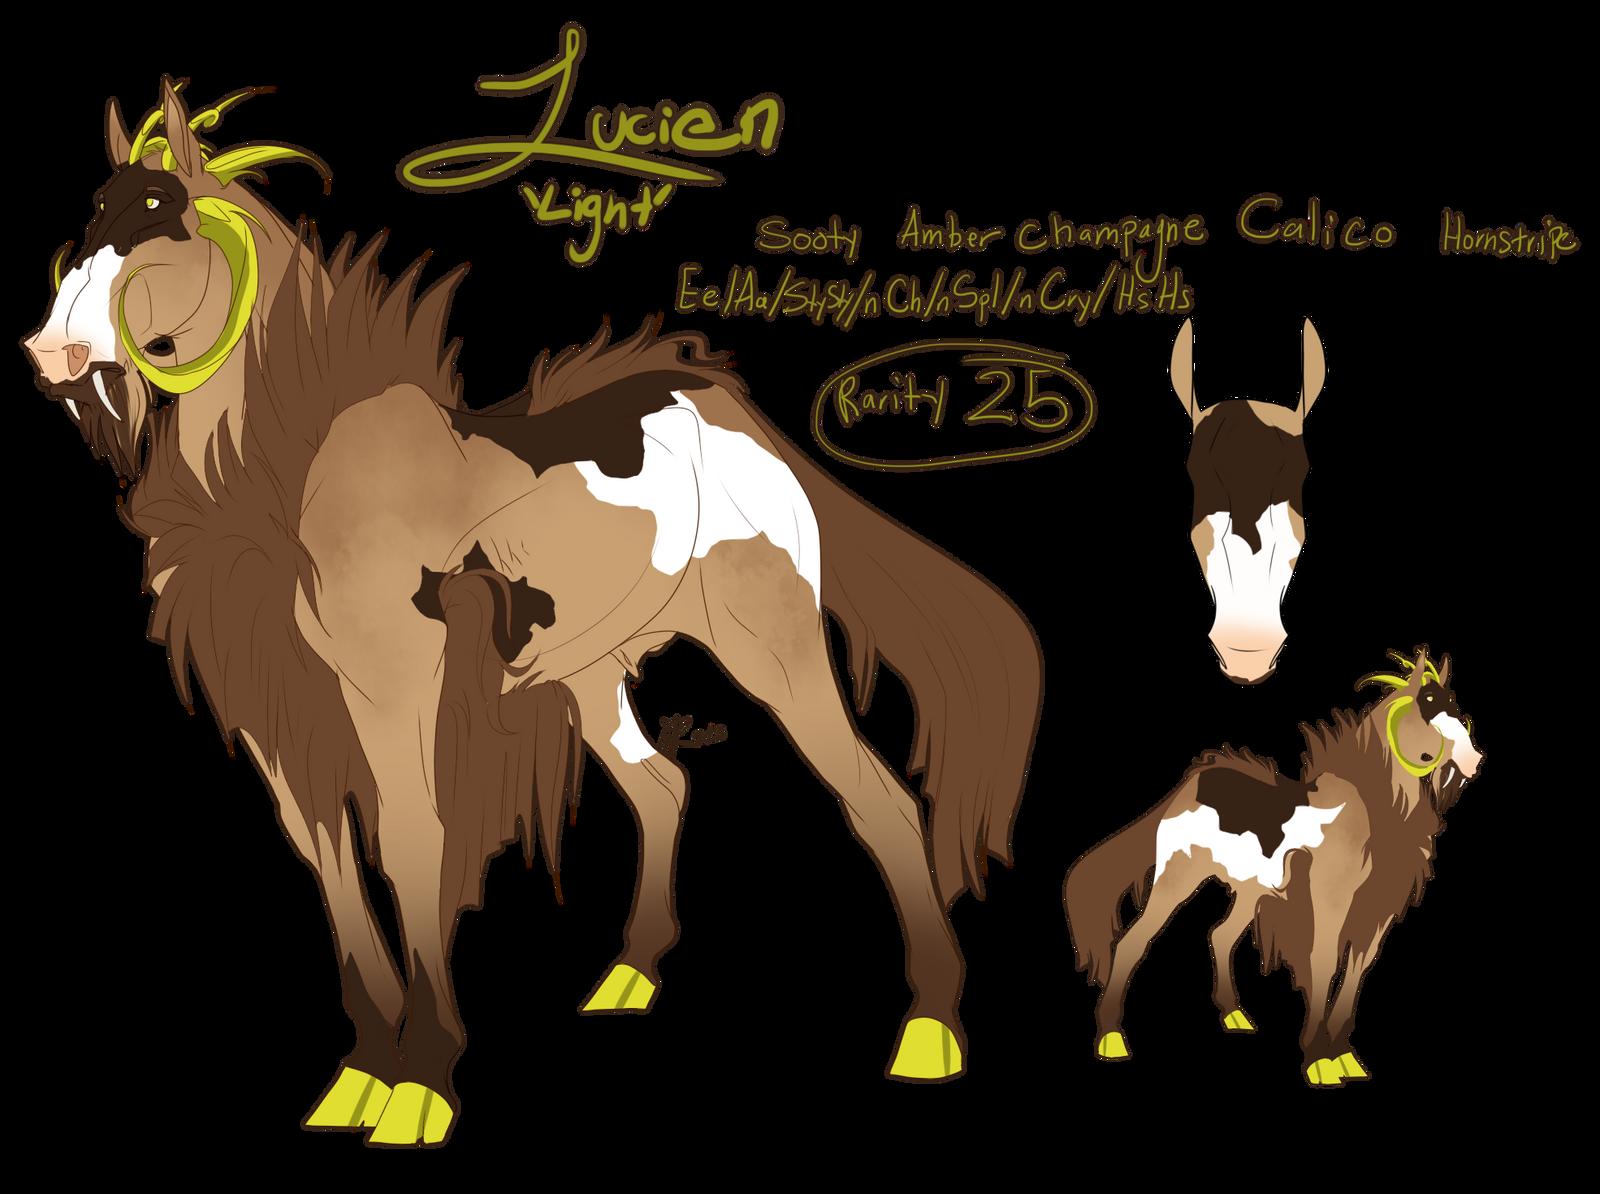 048 Lucien by Fargonon